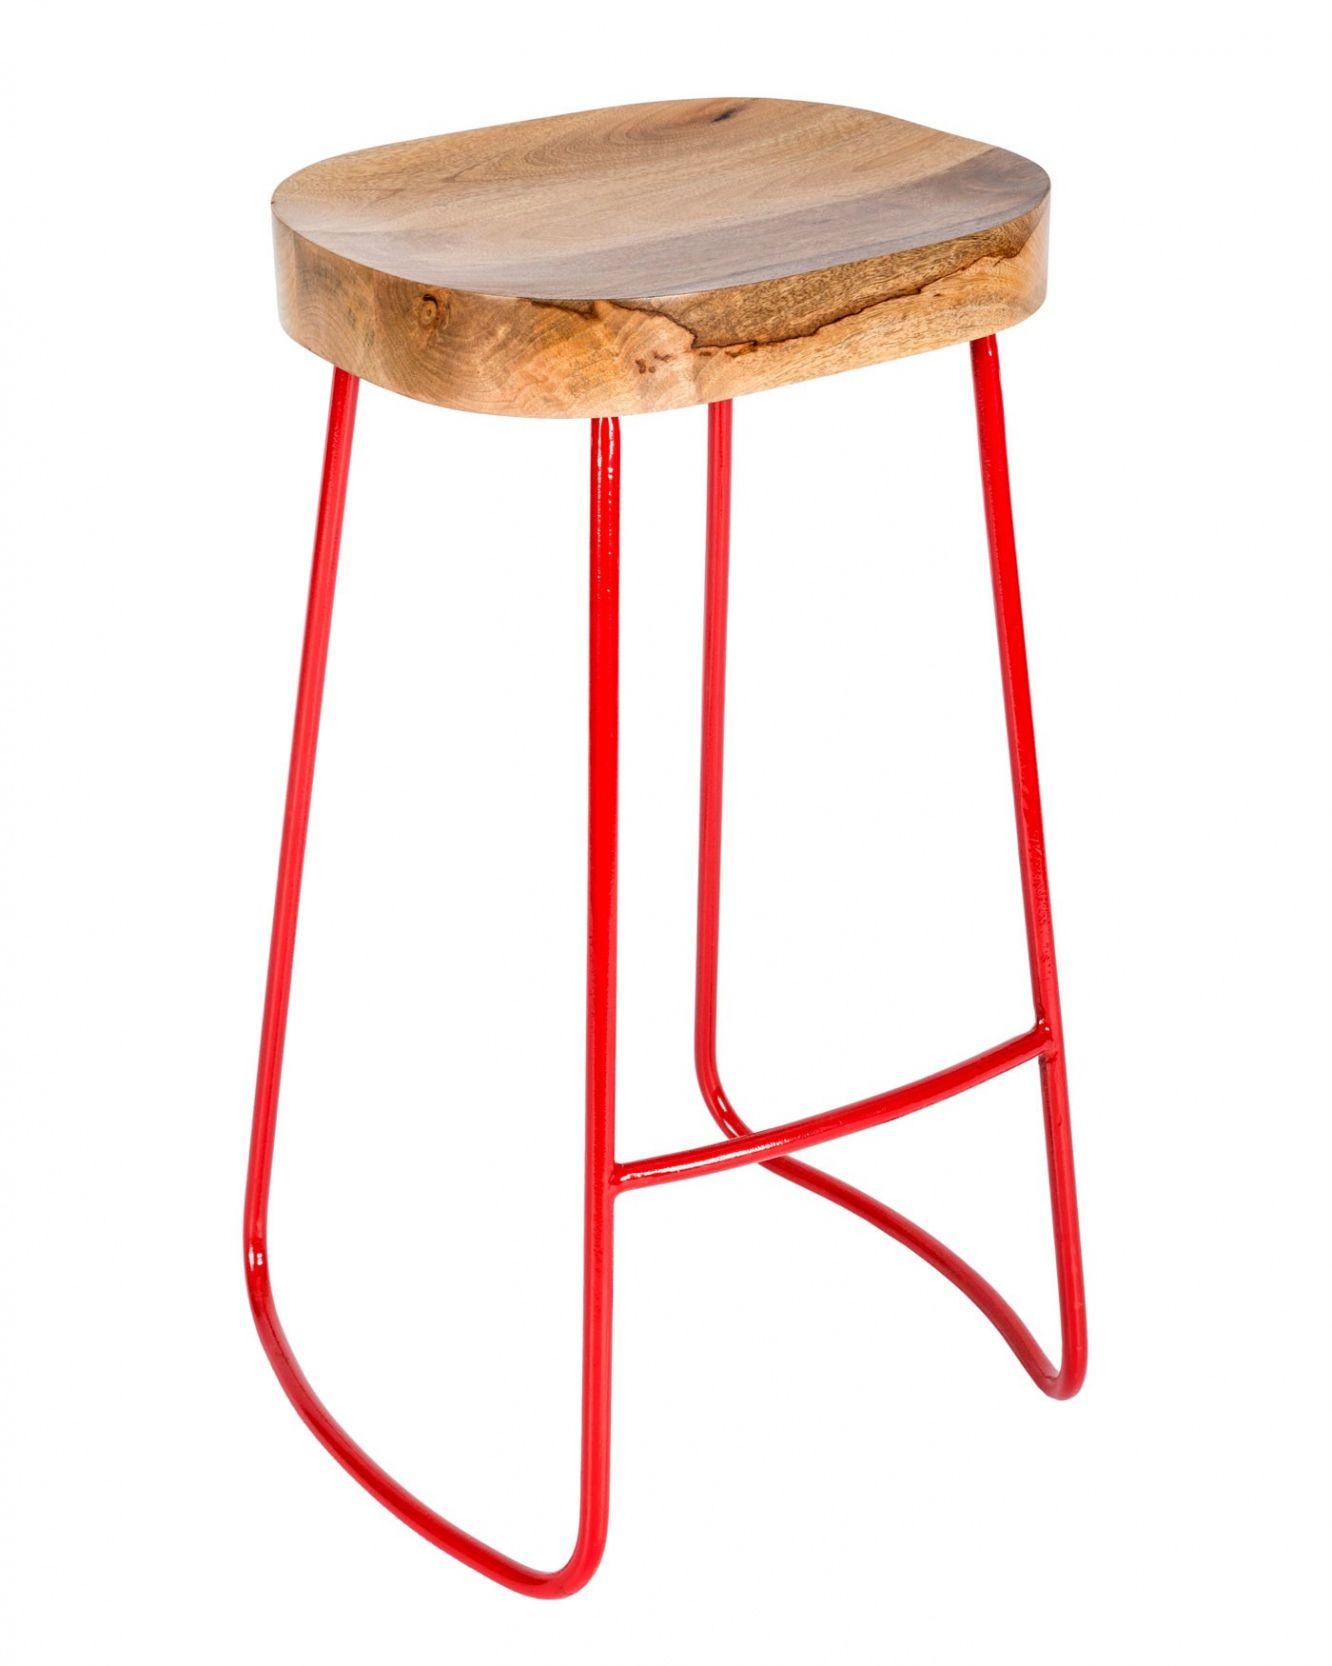 20 Red Industrial Bar Stools Vintage Modern Furniture Check